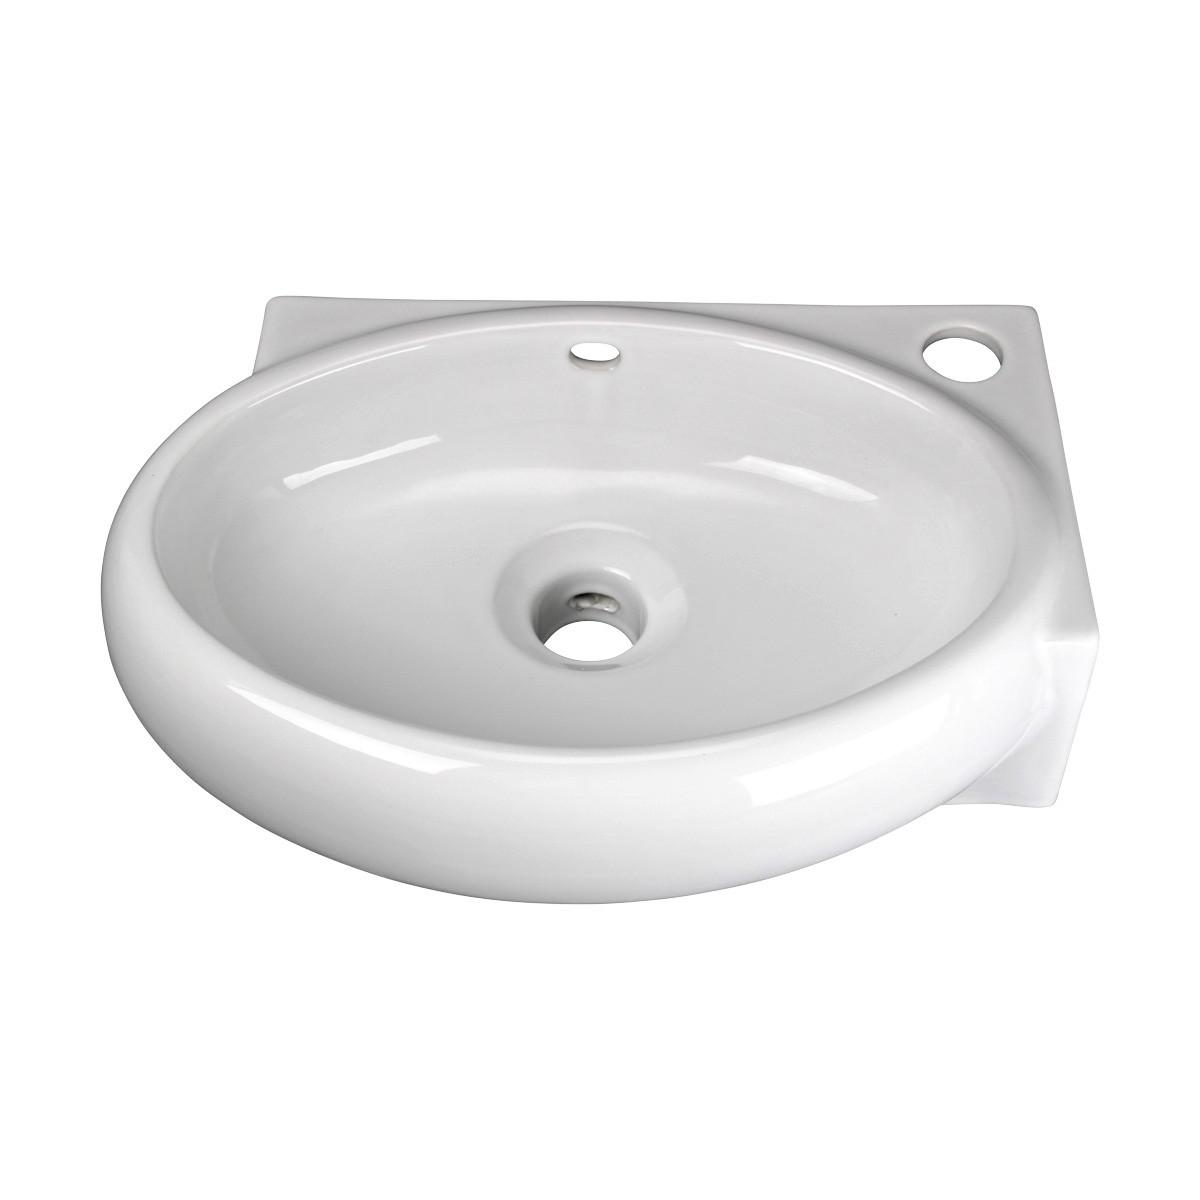 Corner wall mount bathroom sink above counter vessel white - Corner sinks for bathroom ...